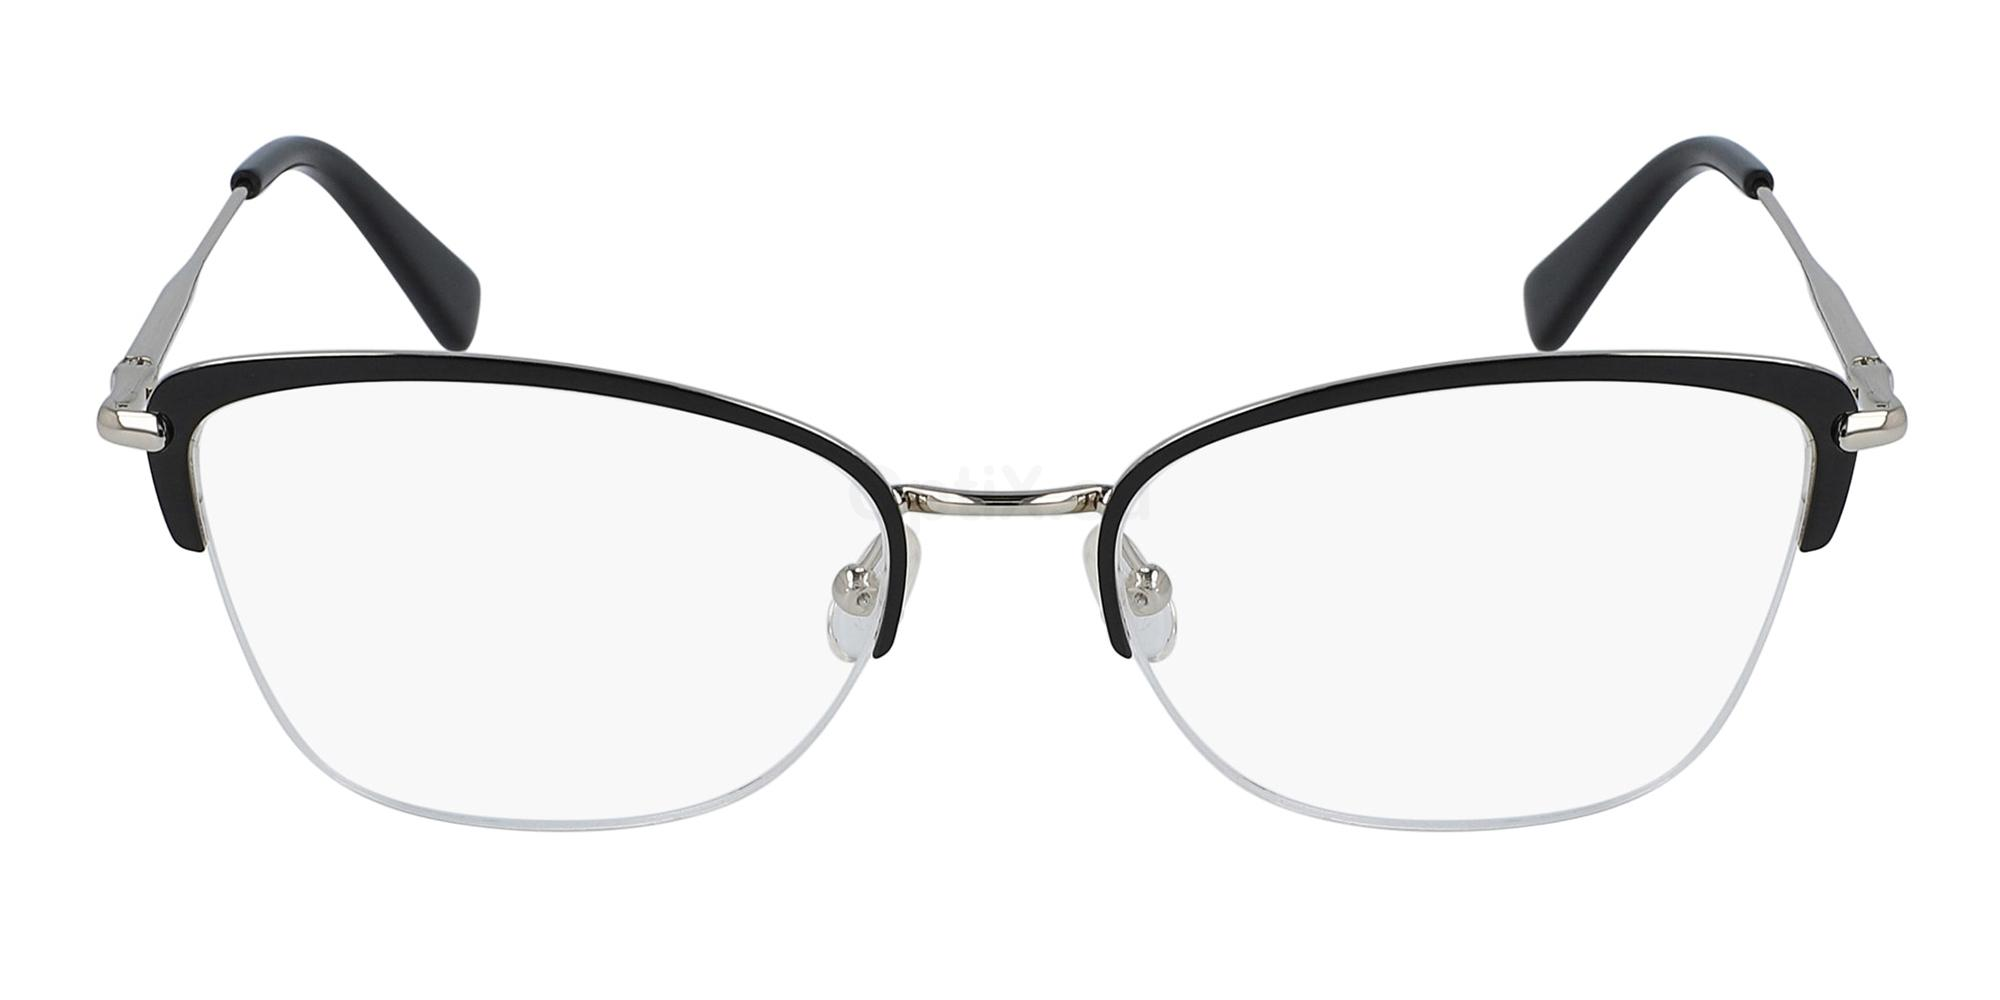 001 LO2118 Glasses, LONGCHAMP